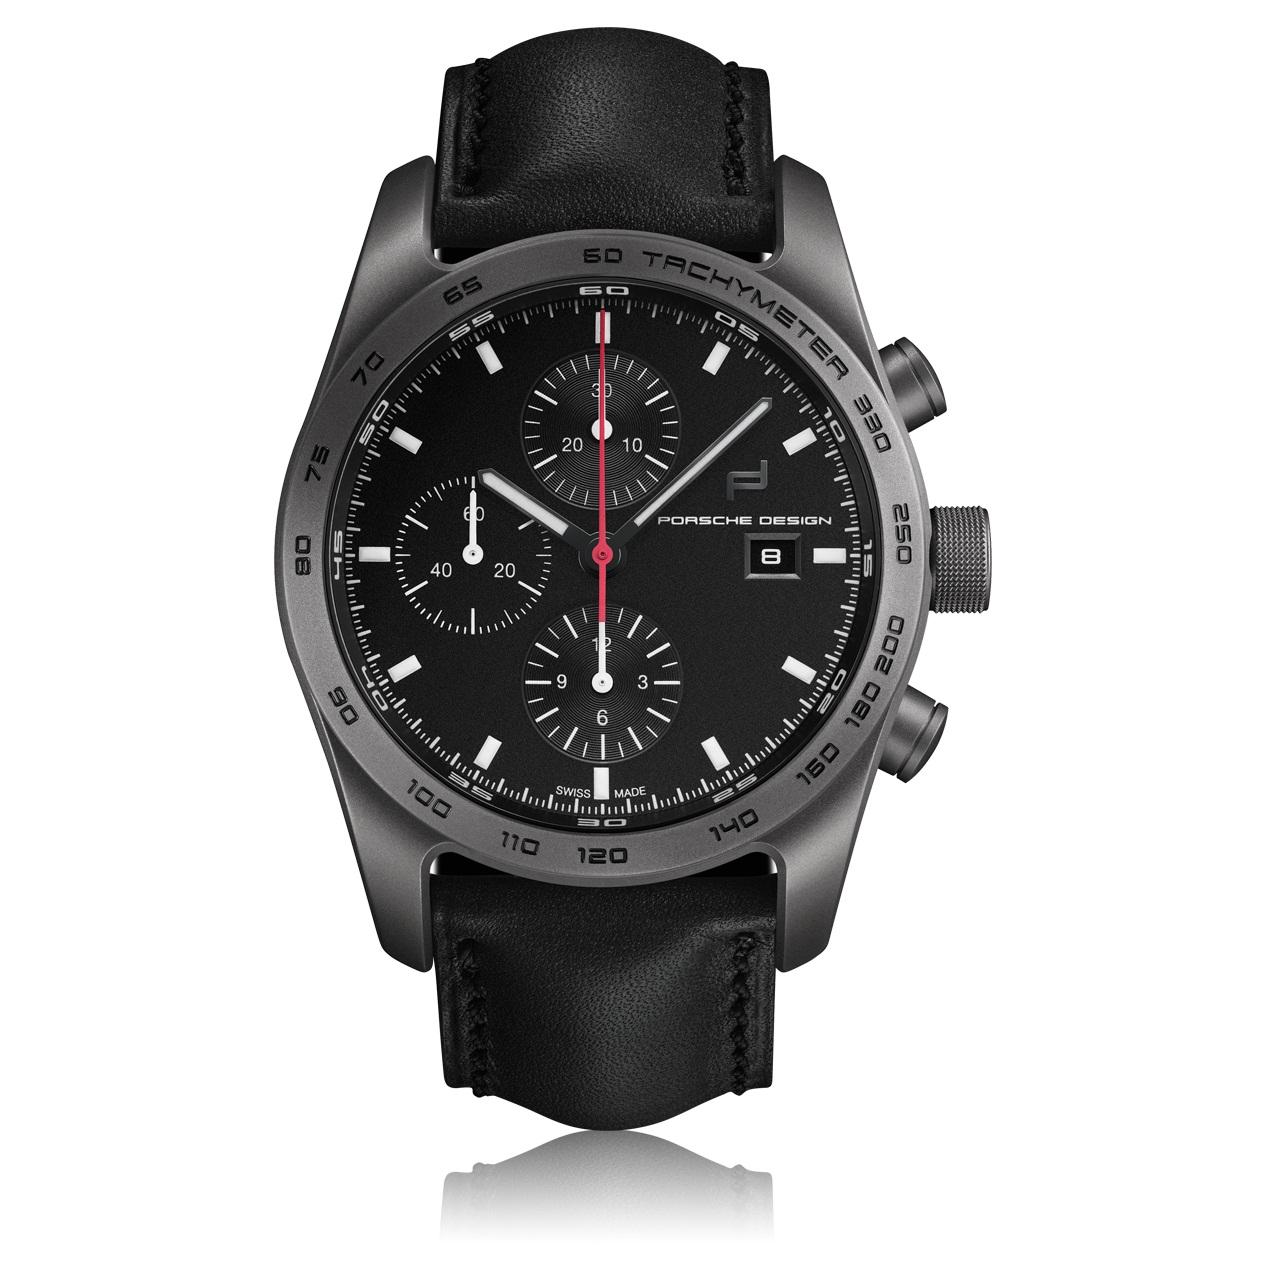 Porsche Design Chronograph Titanium Ltd. Ed